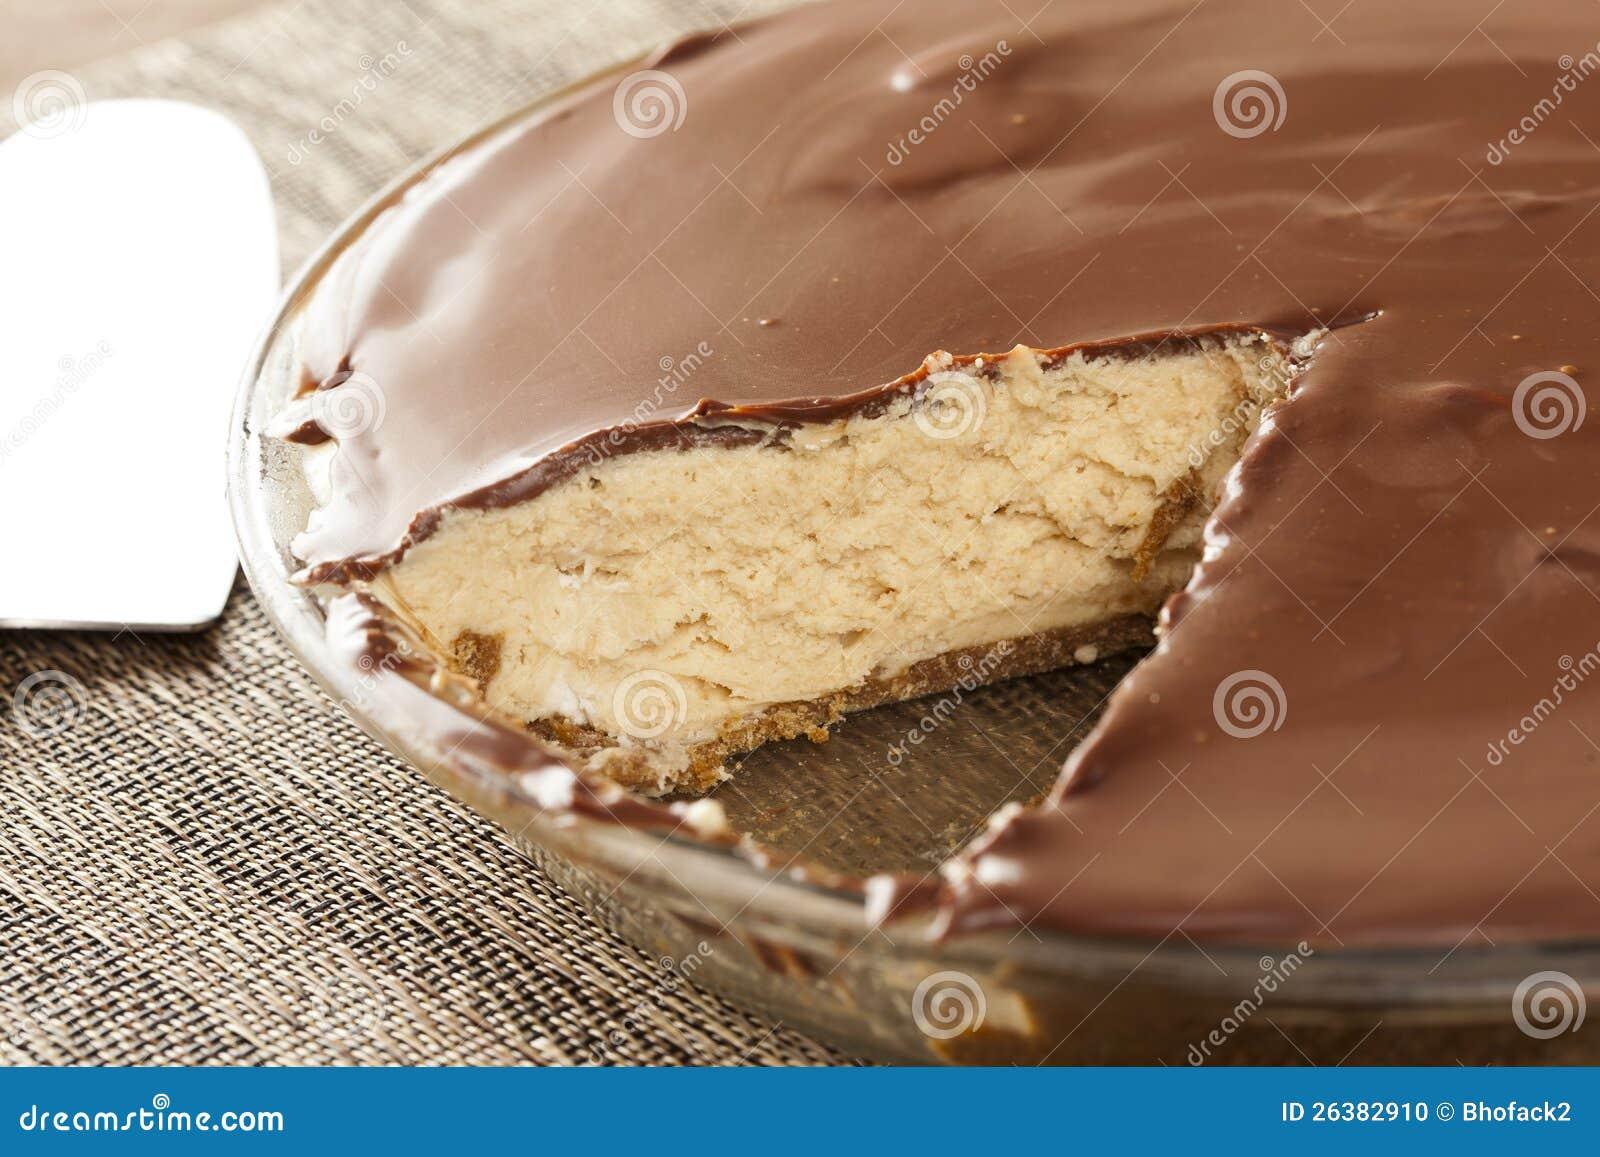 Download Gourmet Peanut Butter Pie stock photo. Image of crust - 26382910